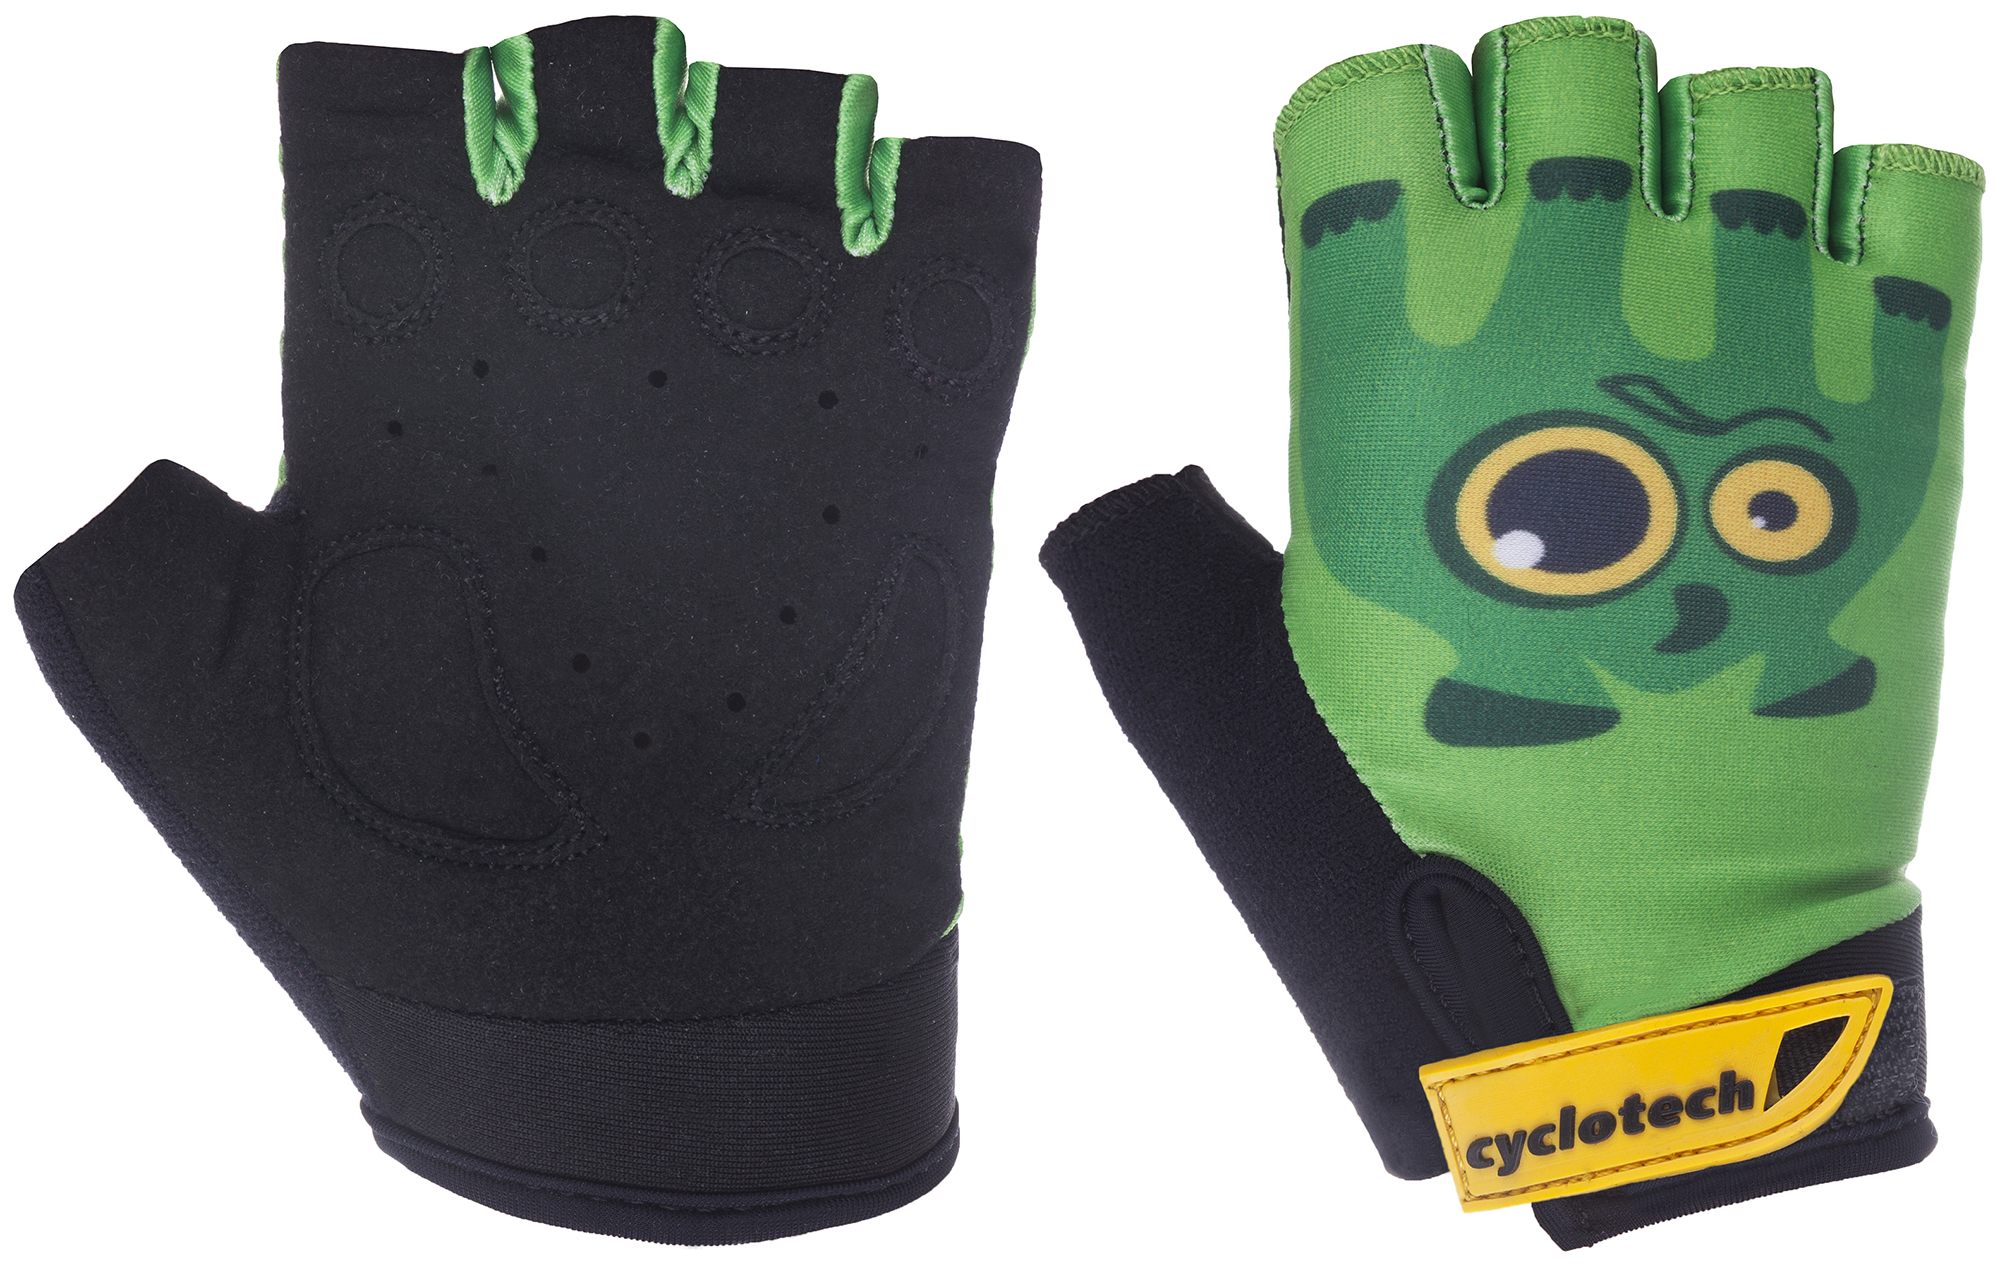 Cyclotech Перчатки велосипедные детские Cyclotech Racer машинка для чистки цепи cyclotech cyclotech